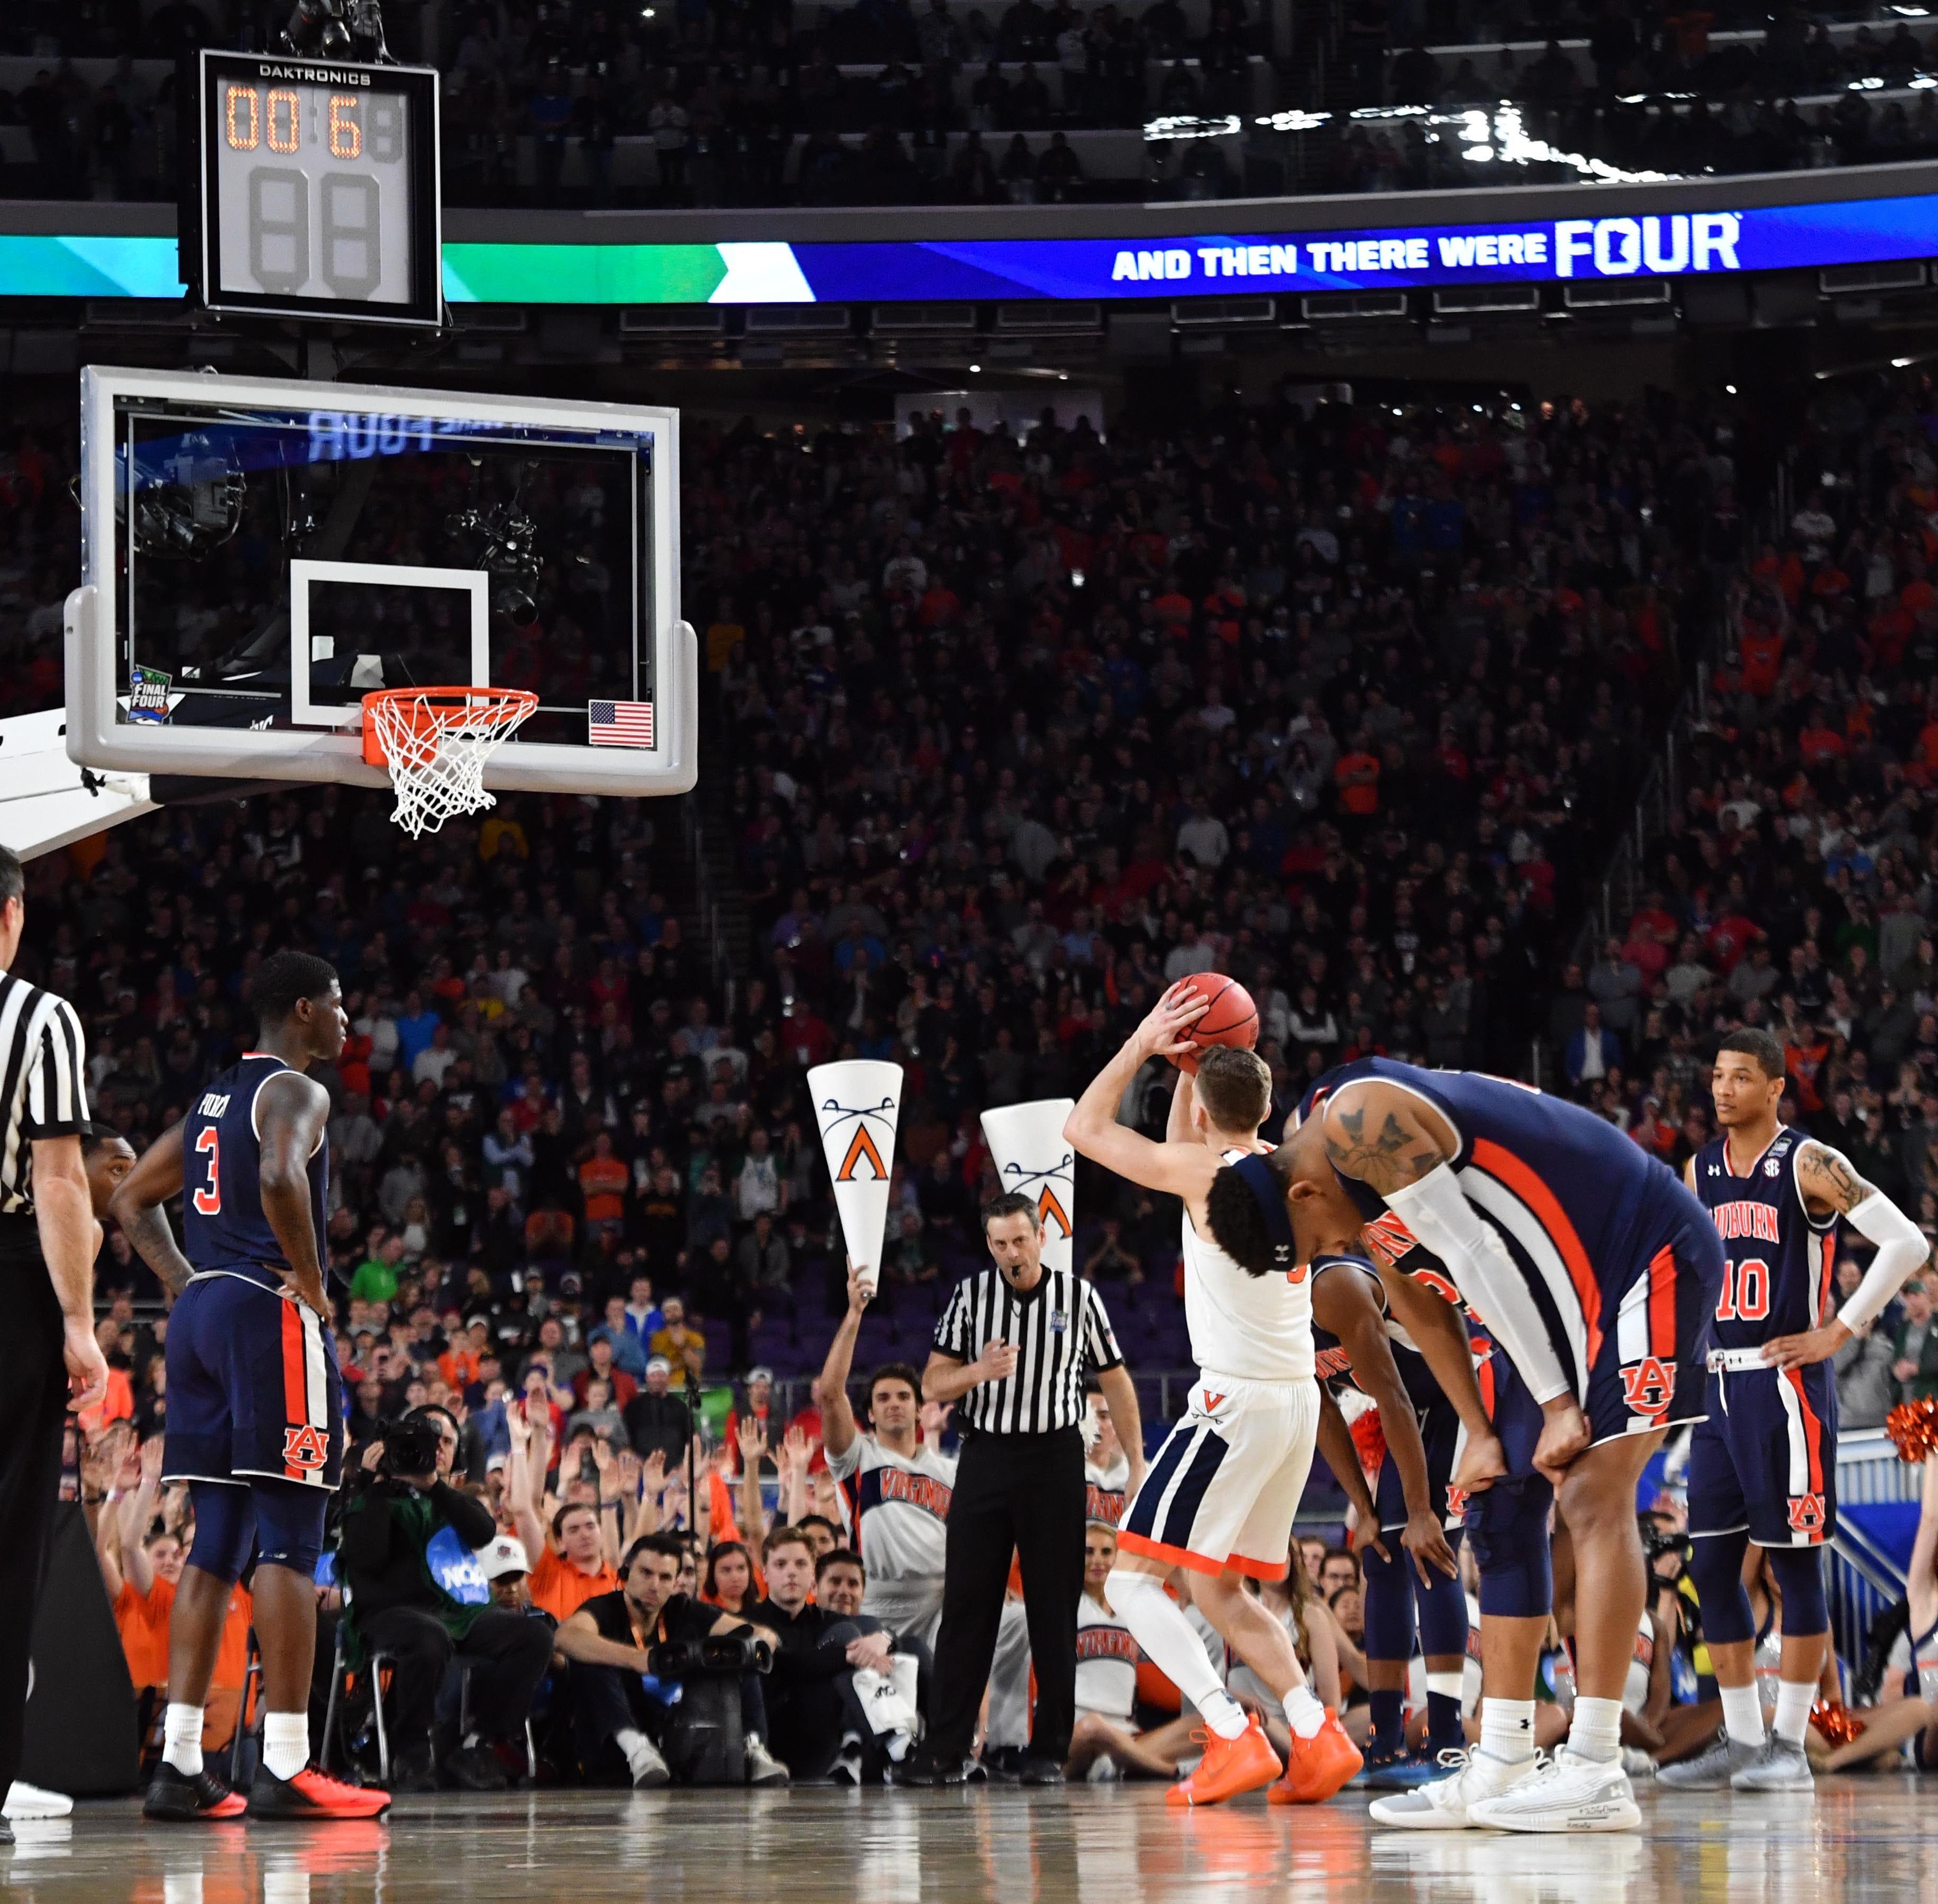 Heartbreak: Auburn's dream season ends with late foul call against Virginia in Final Four